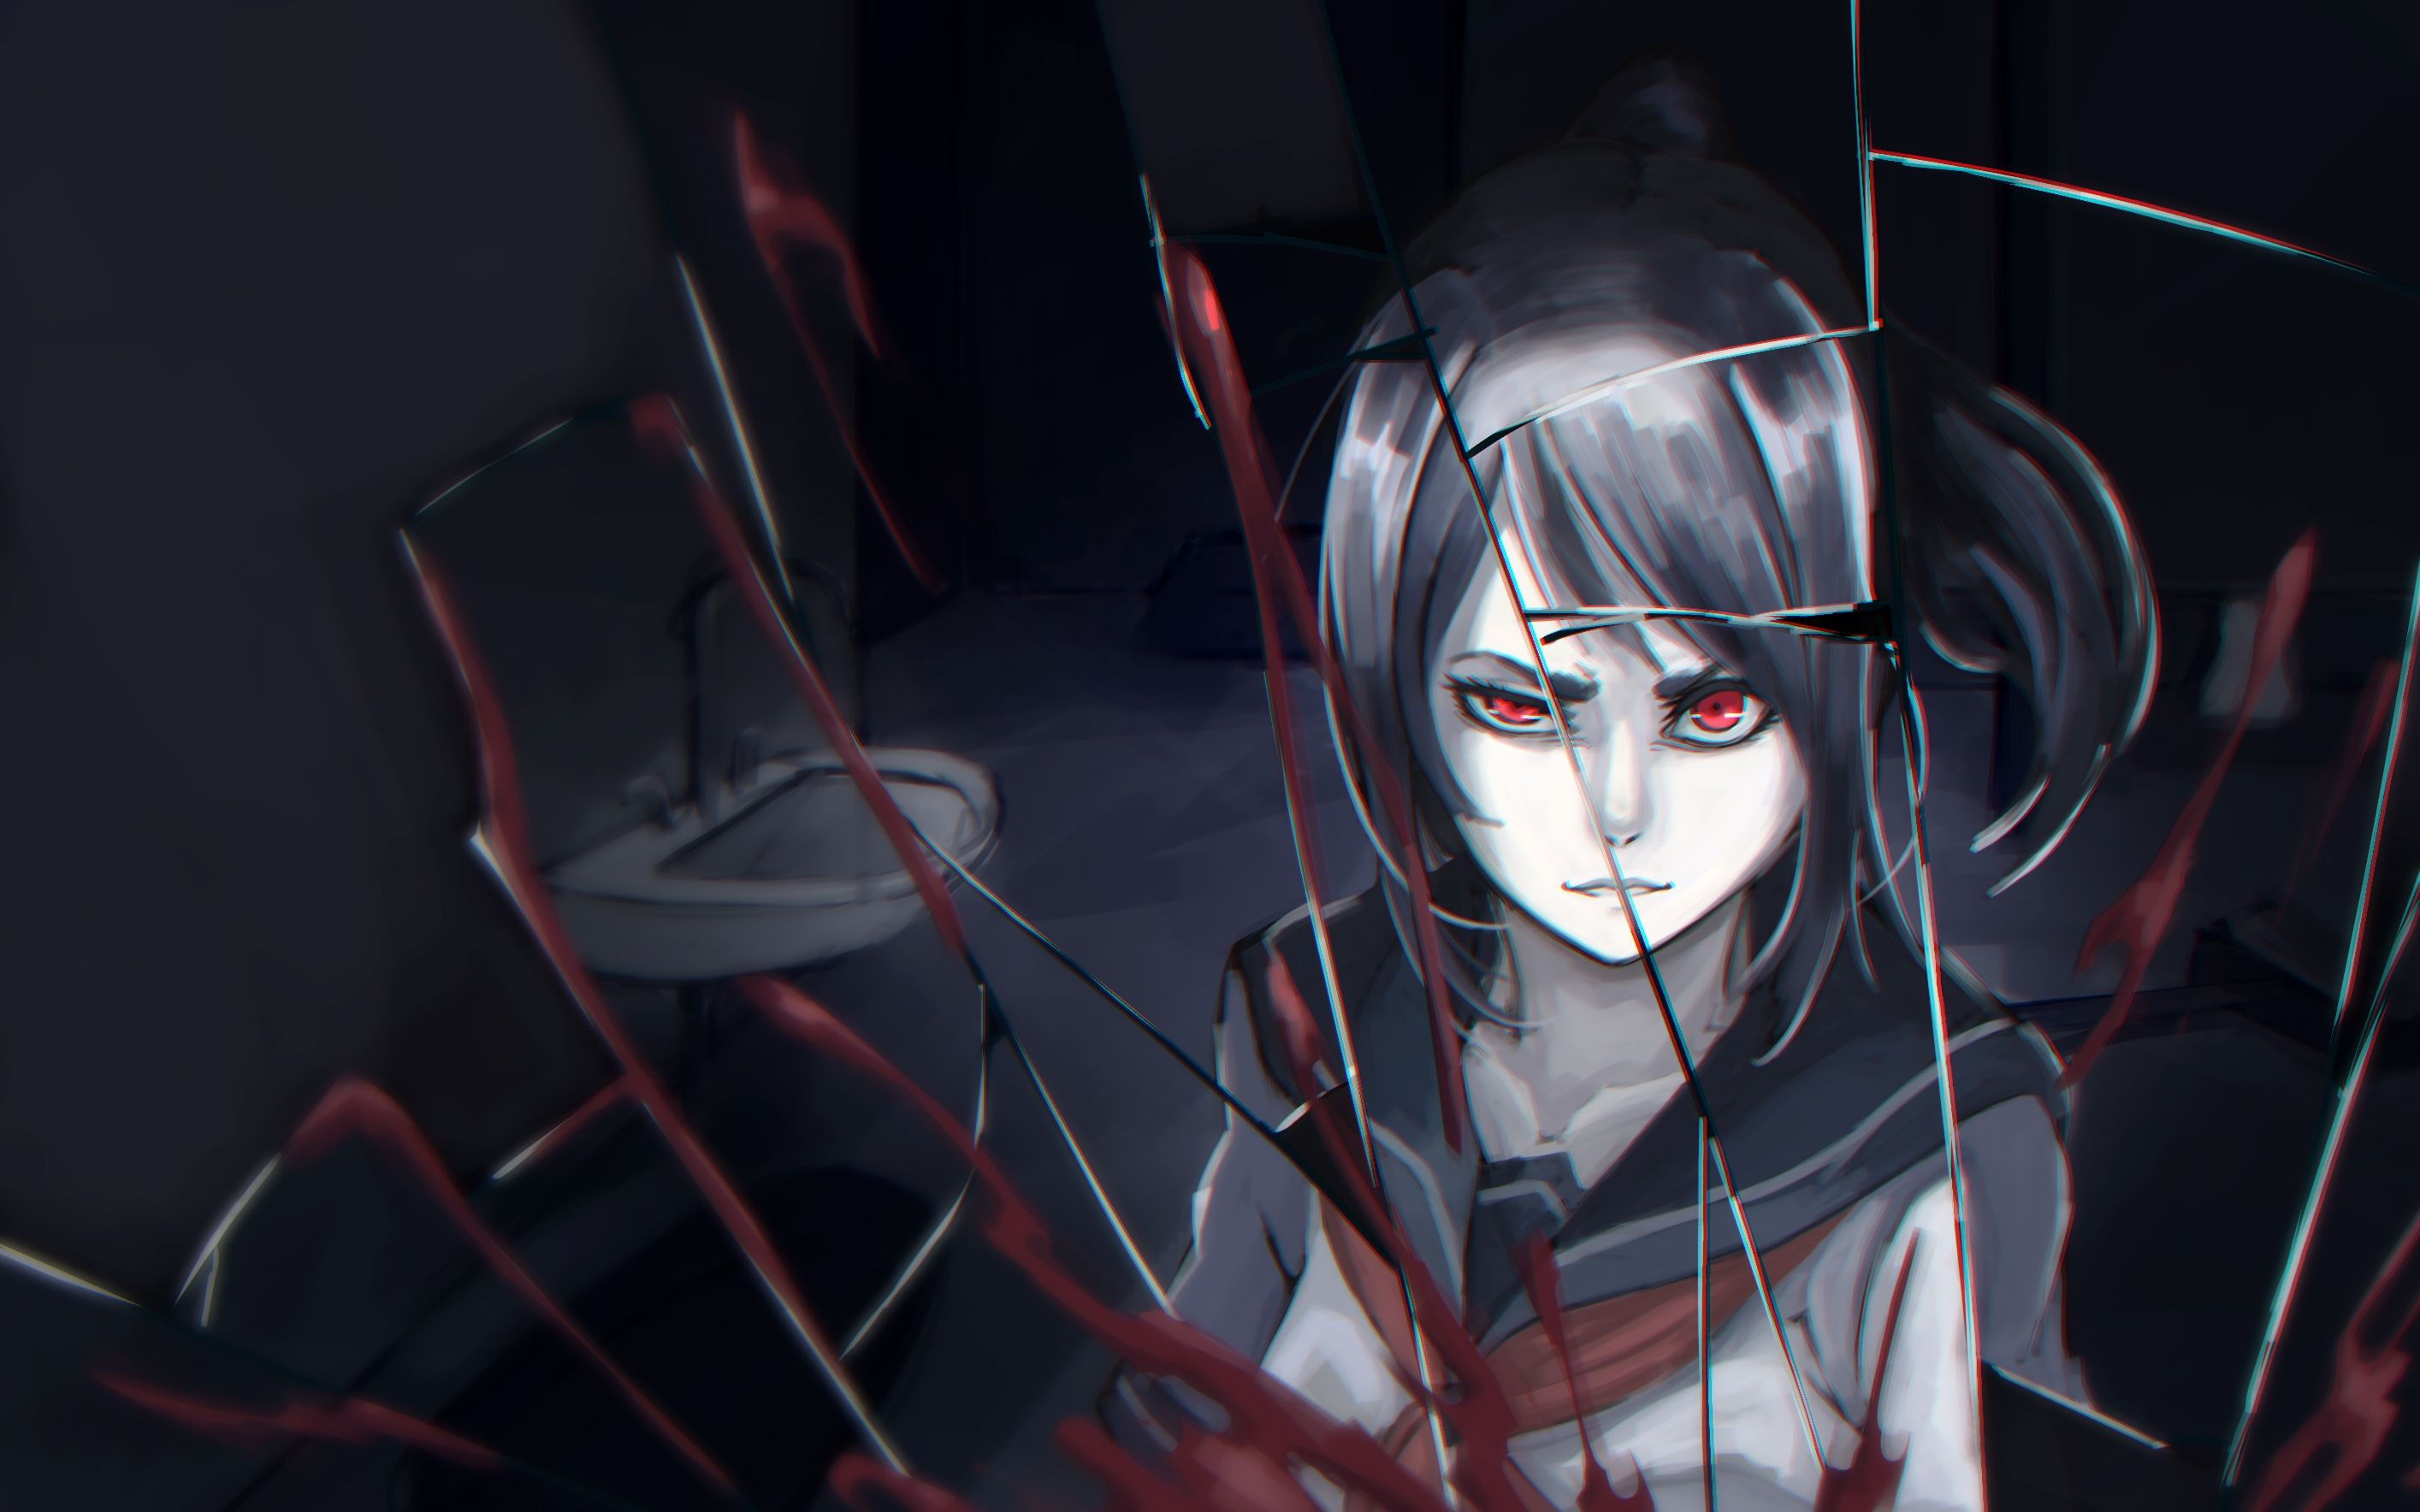 Pin de Anime WallpaperS em Anime & Manga Yandere